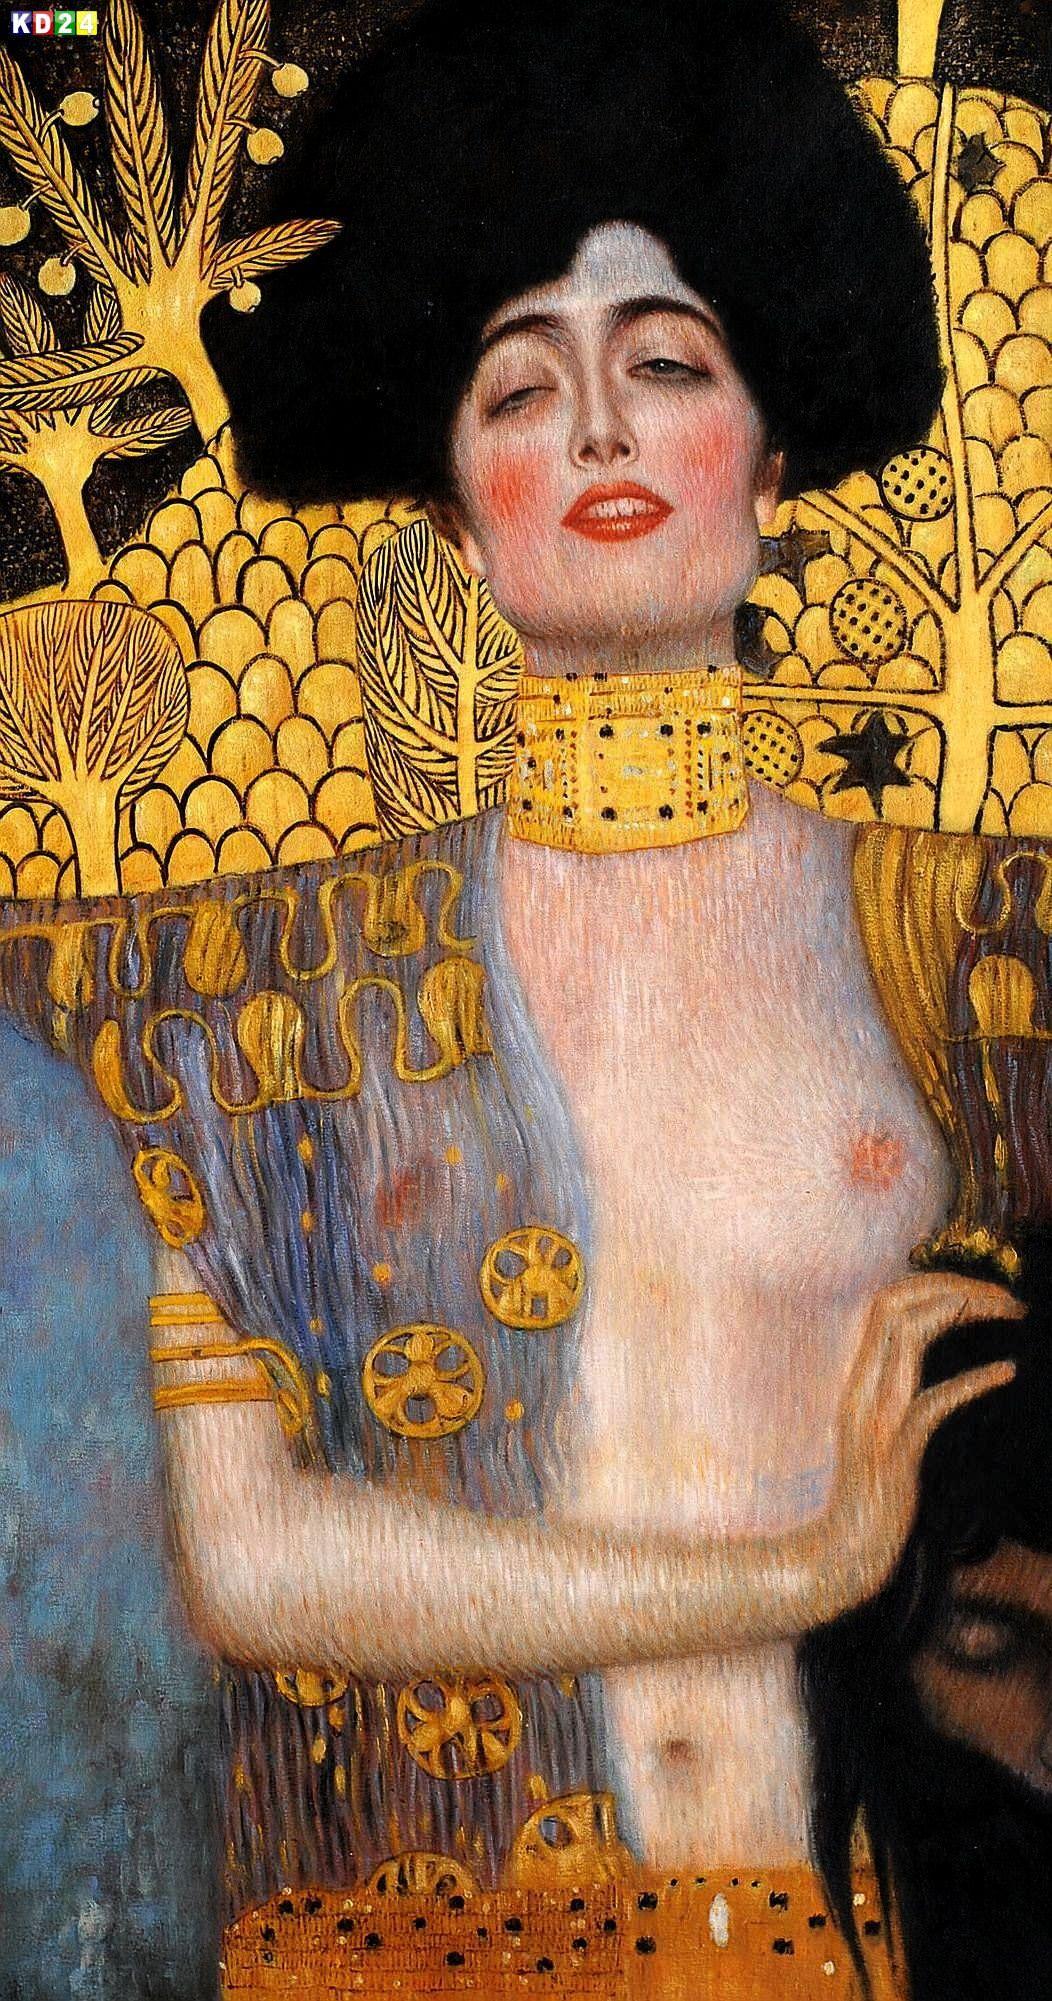 Gustav-Klimt-Judith-f84104-60x120cm-Jugendstil-Olbild-handgemalt ...